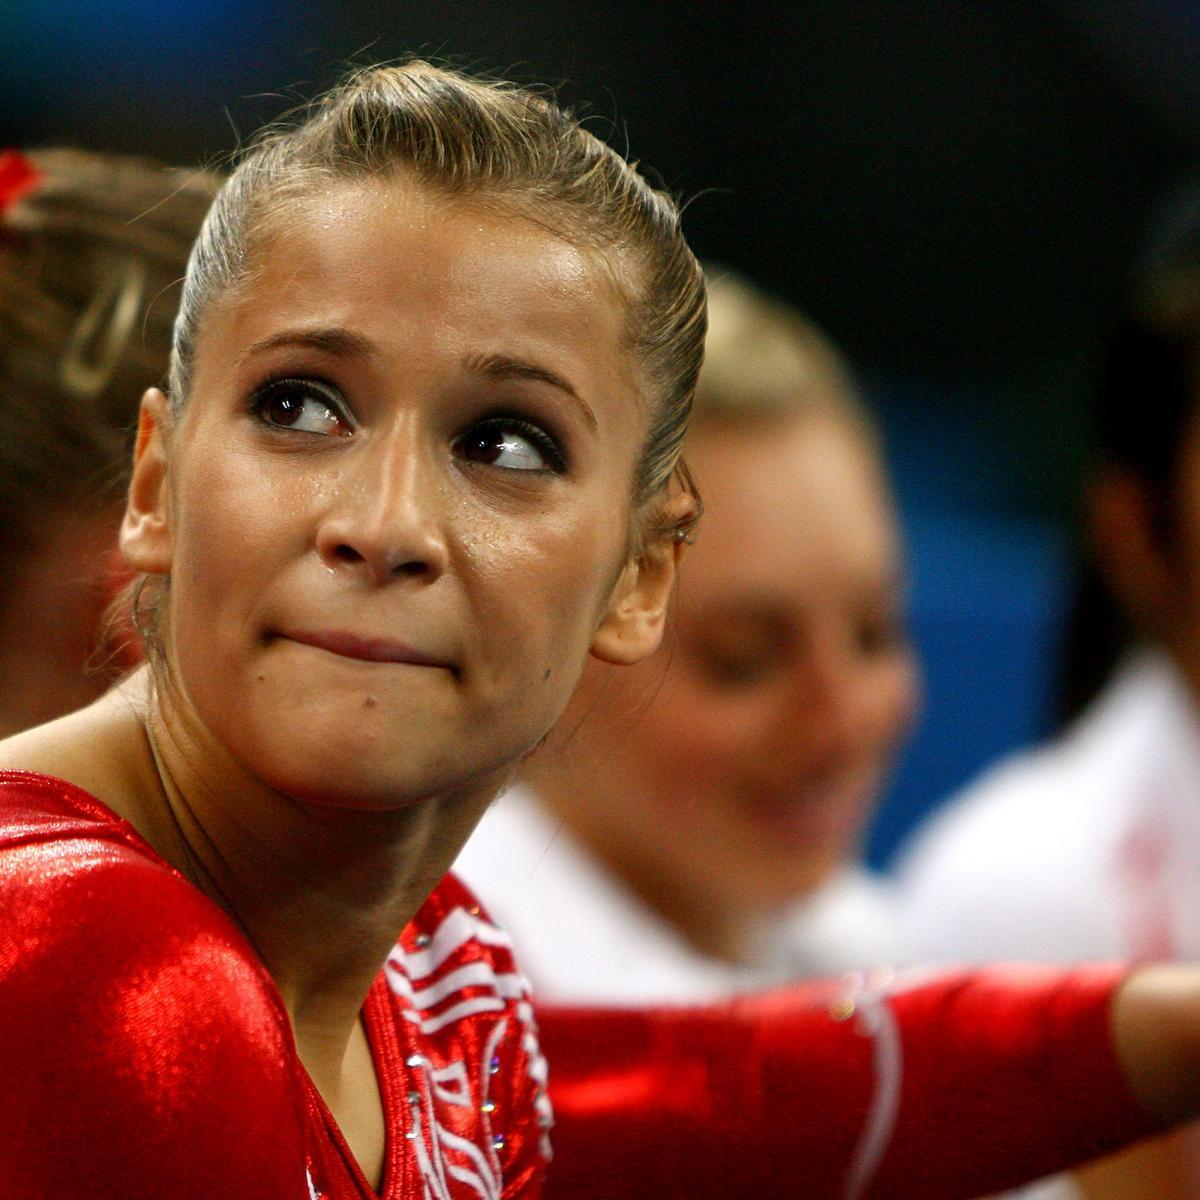 Gymnastics Olympic Trials 2012 Alicia Sacramone Was